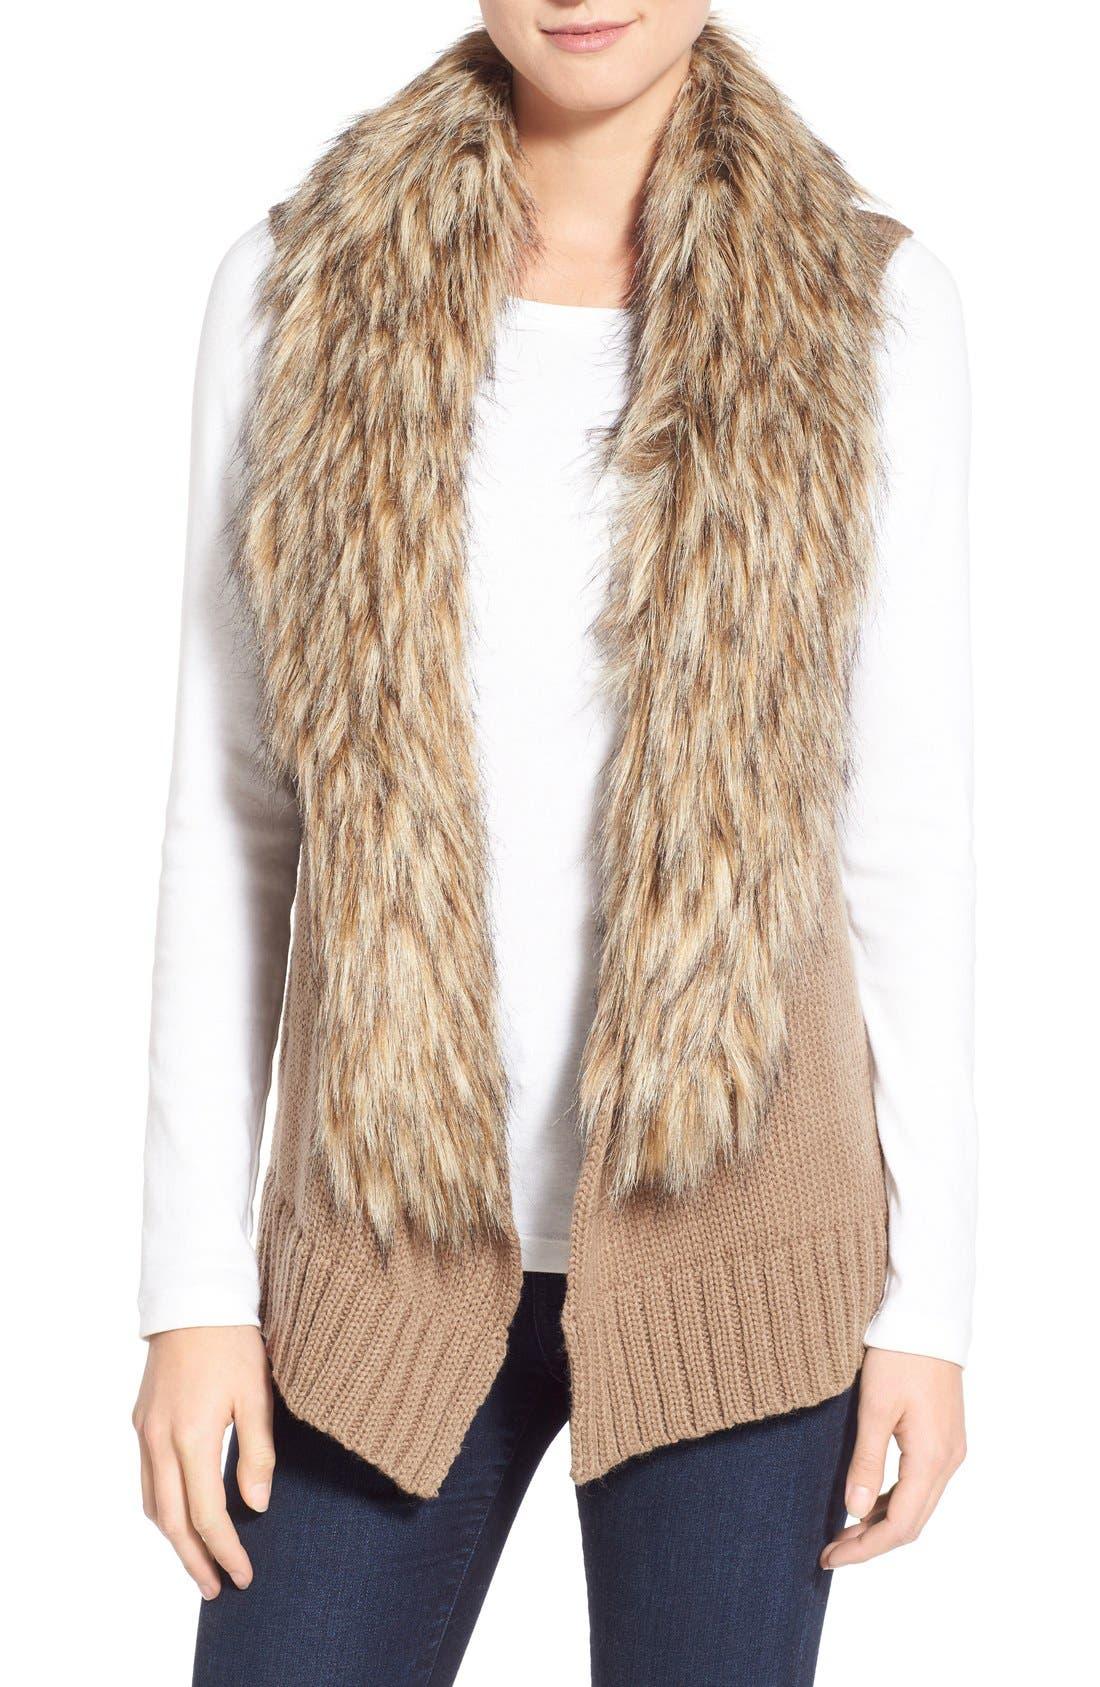 Alternate Image 1 Selected - BB Dakota 'Sadi' Faux Fur Trim Knit Vest